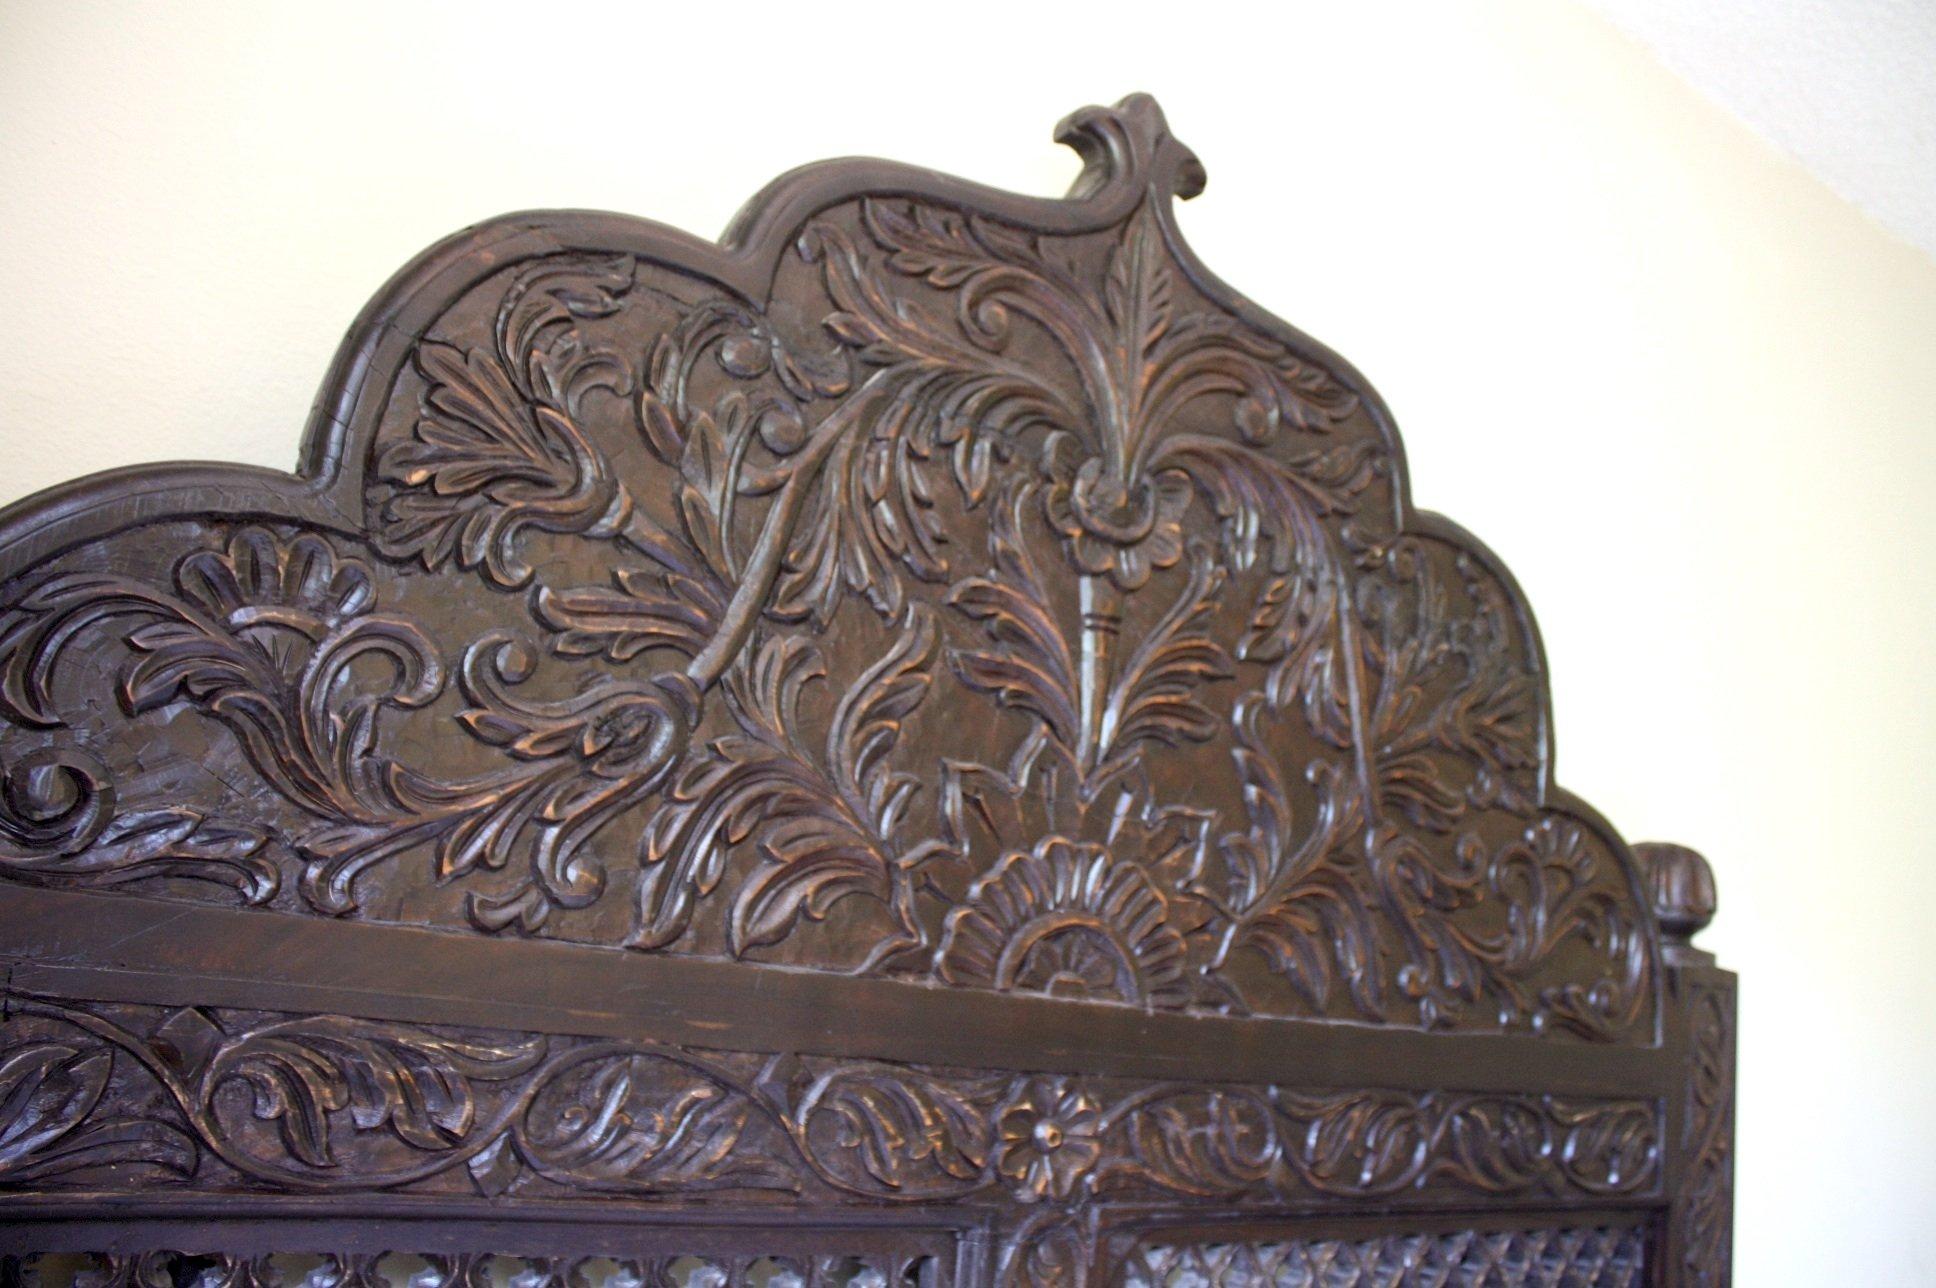 Carved Lattice Headboard by Worldcraft Industries, Standard King